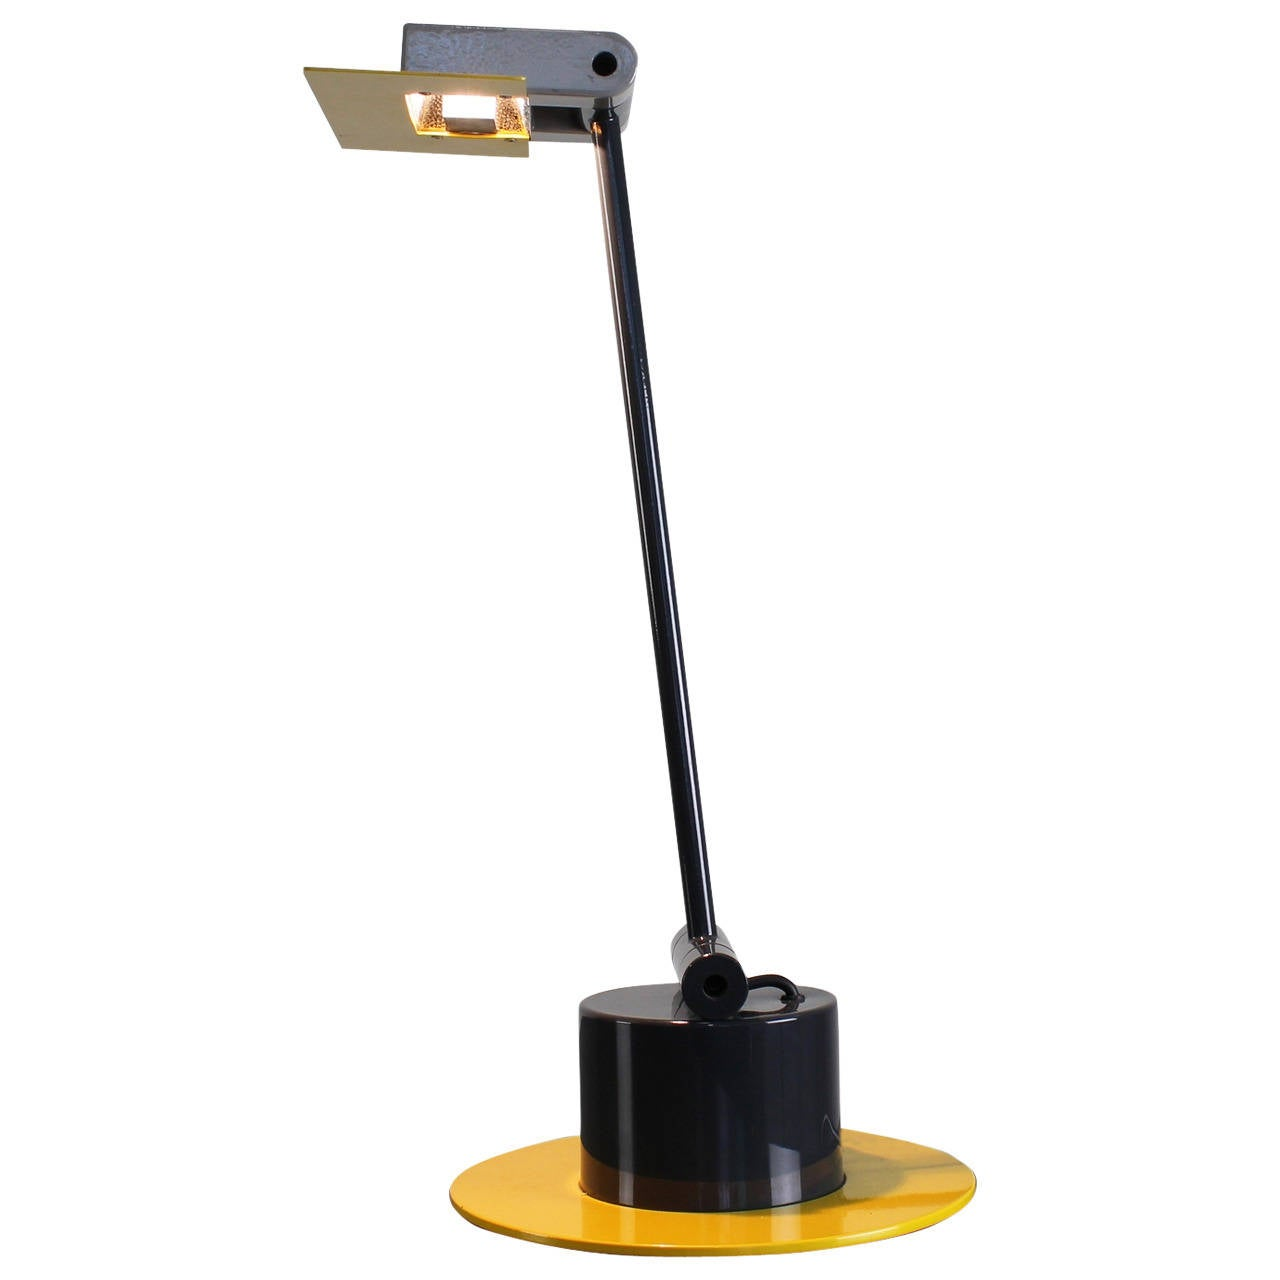 ettore sottsass associati 1980s aero table lamp for bieffeplast